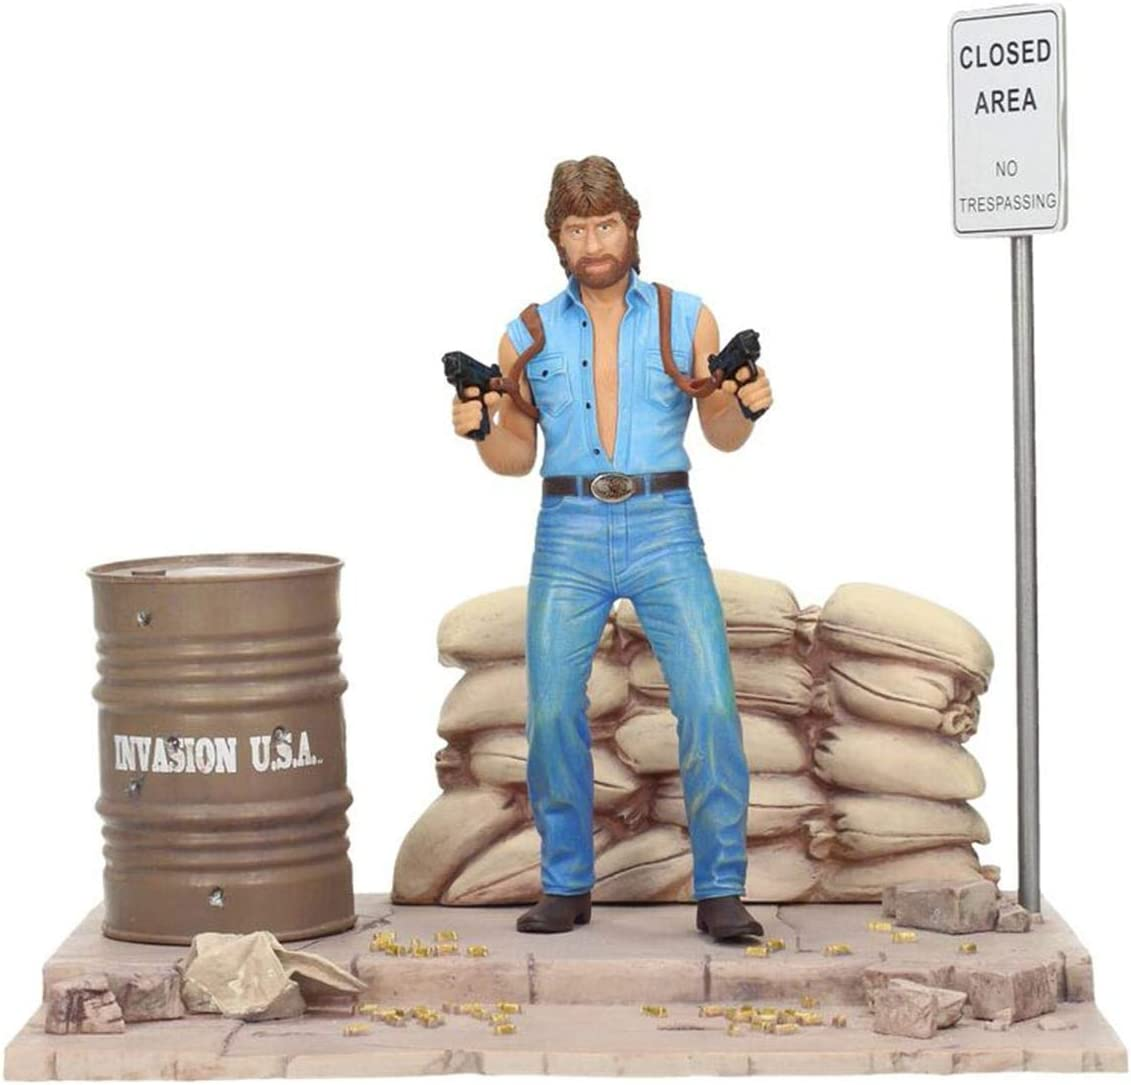 0cm x 18cm Deluxe Set Figur Matt Hunter Close Up Chuck Norris Invasion U.S.A